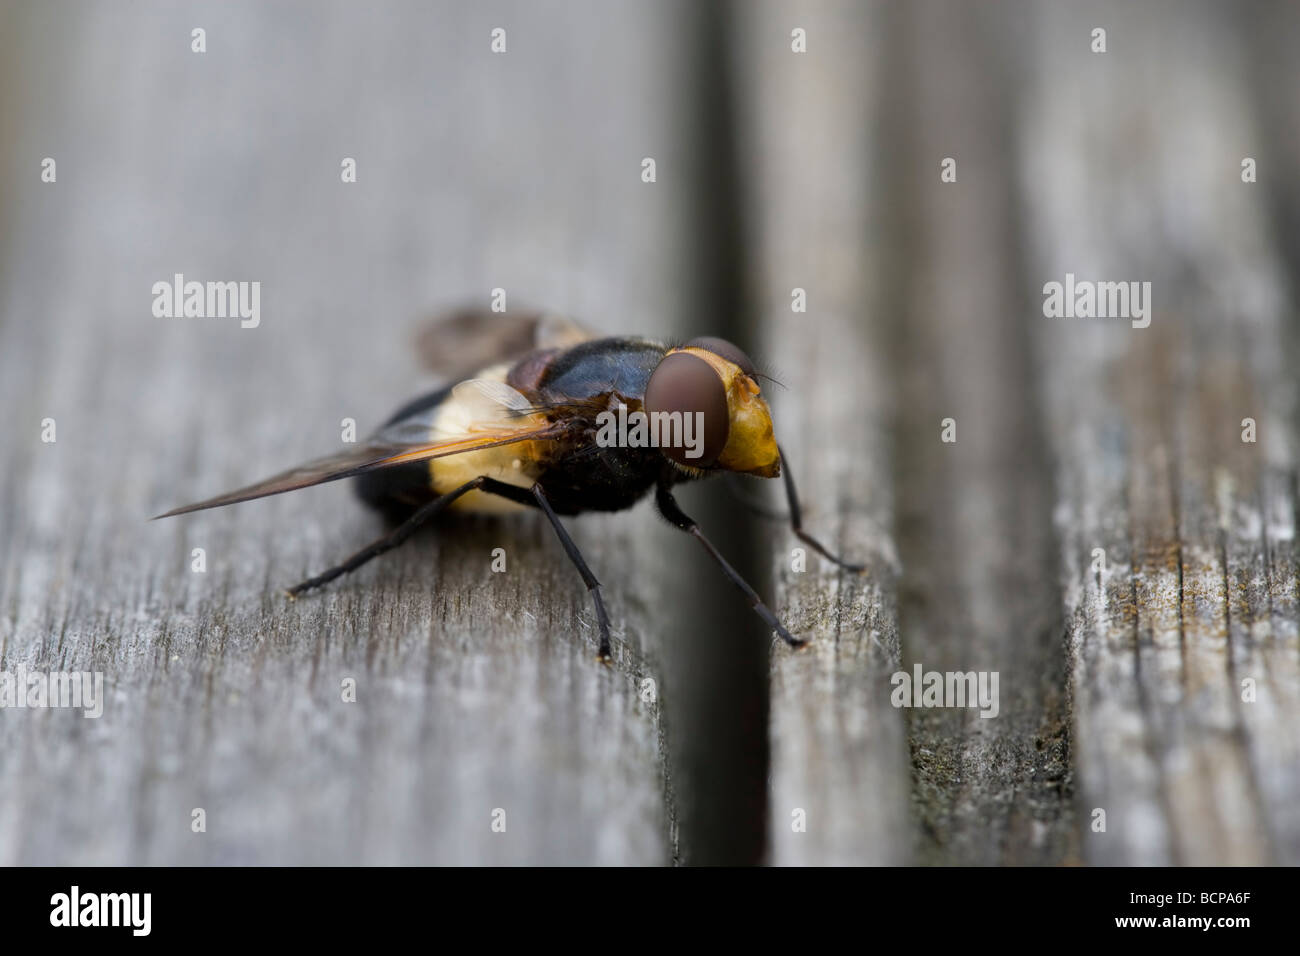 Volucella Inflata Fly True Flies Order Diptera Stock Photo